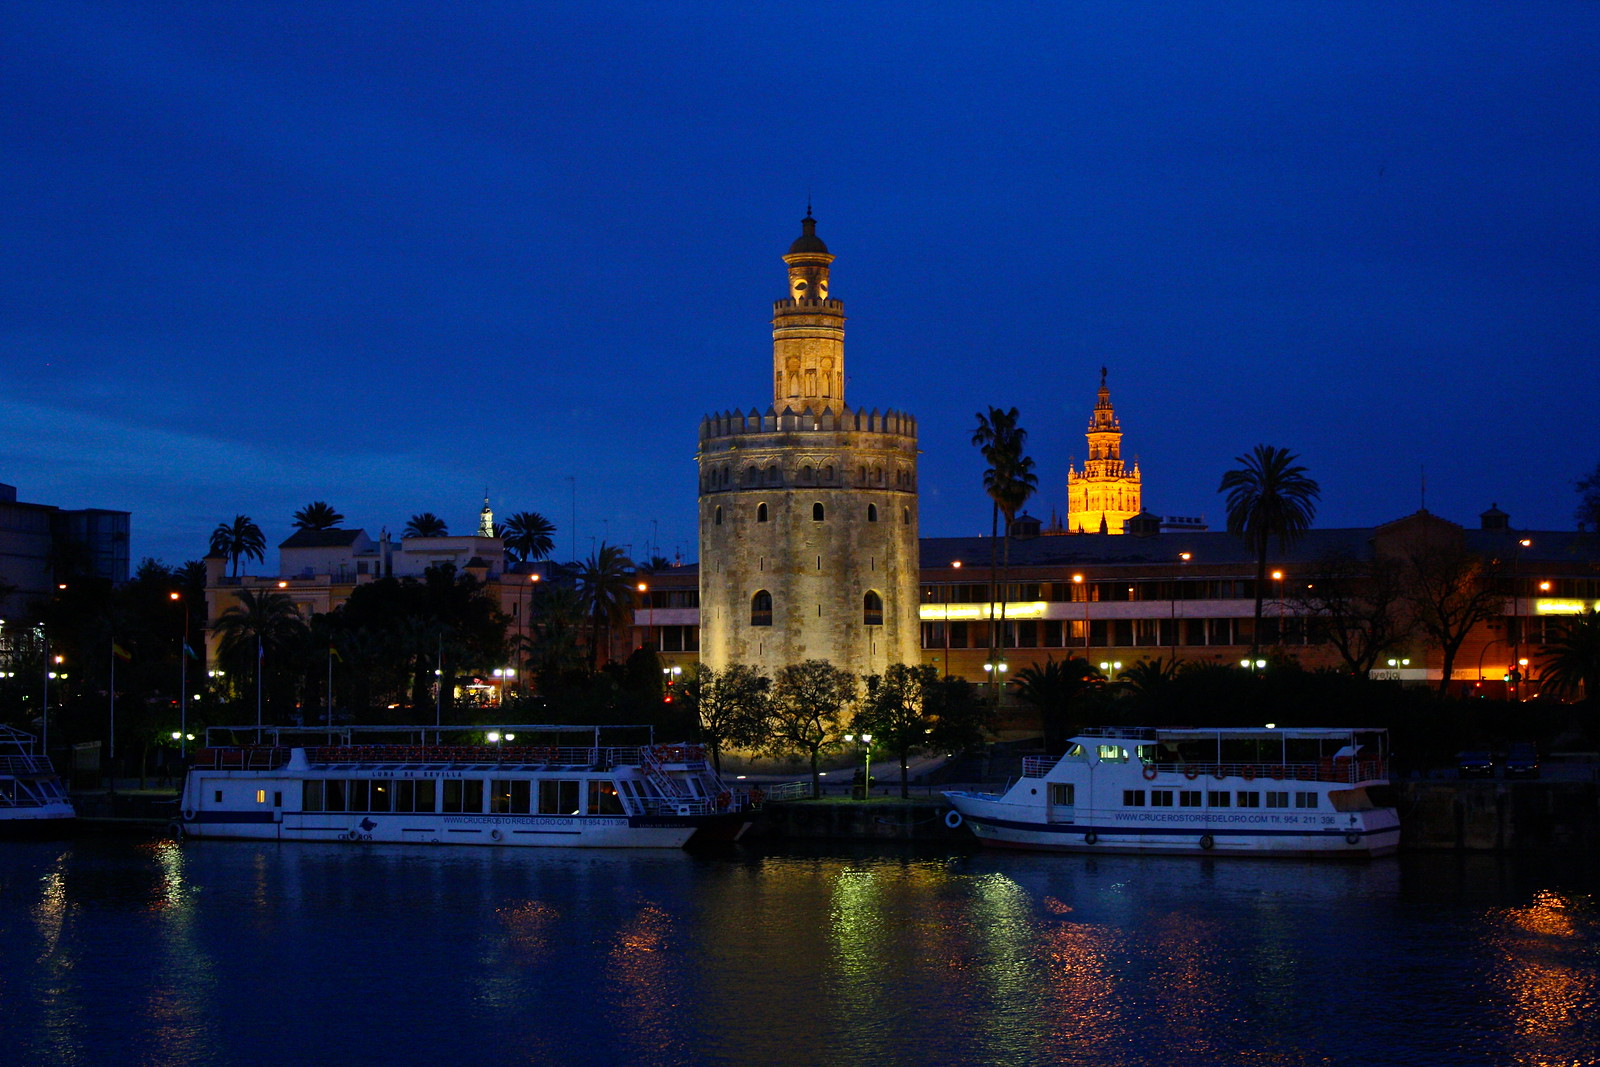 Sevilla, Spain: The Heartbeat of Andalucía